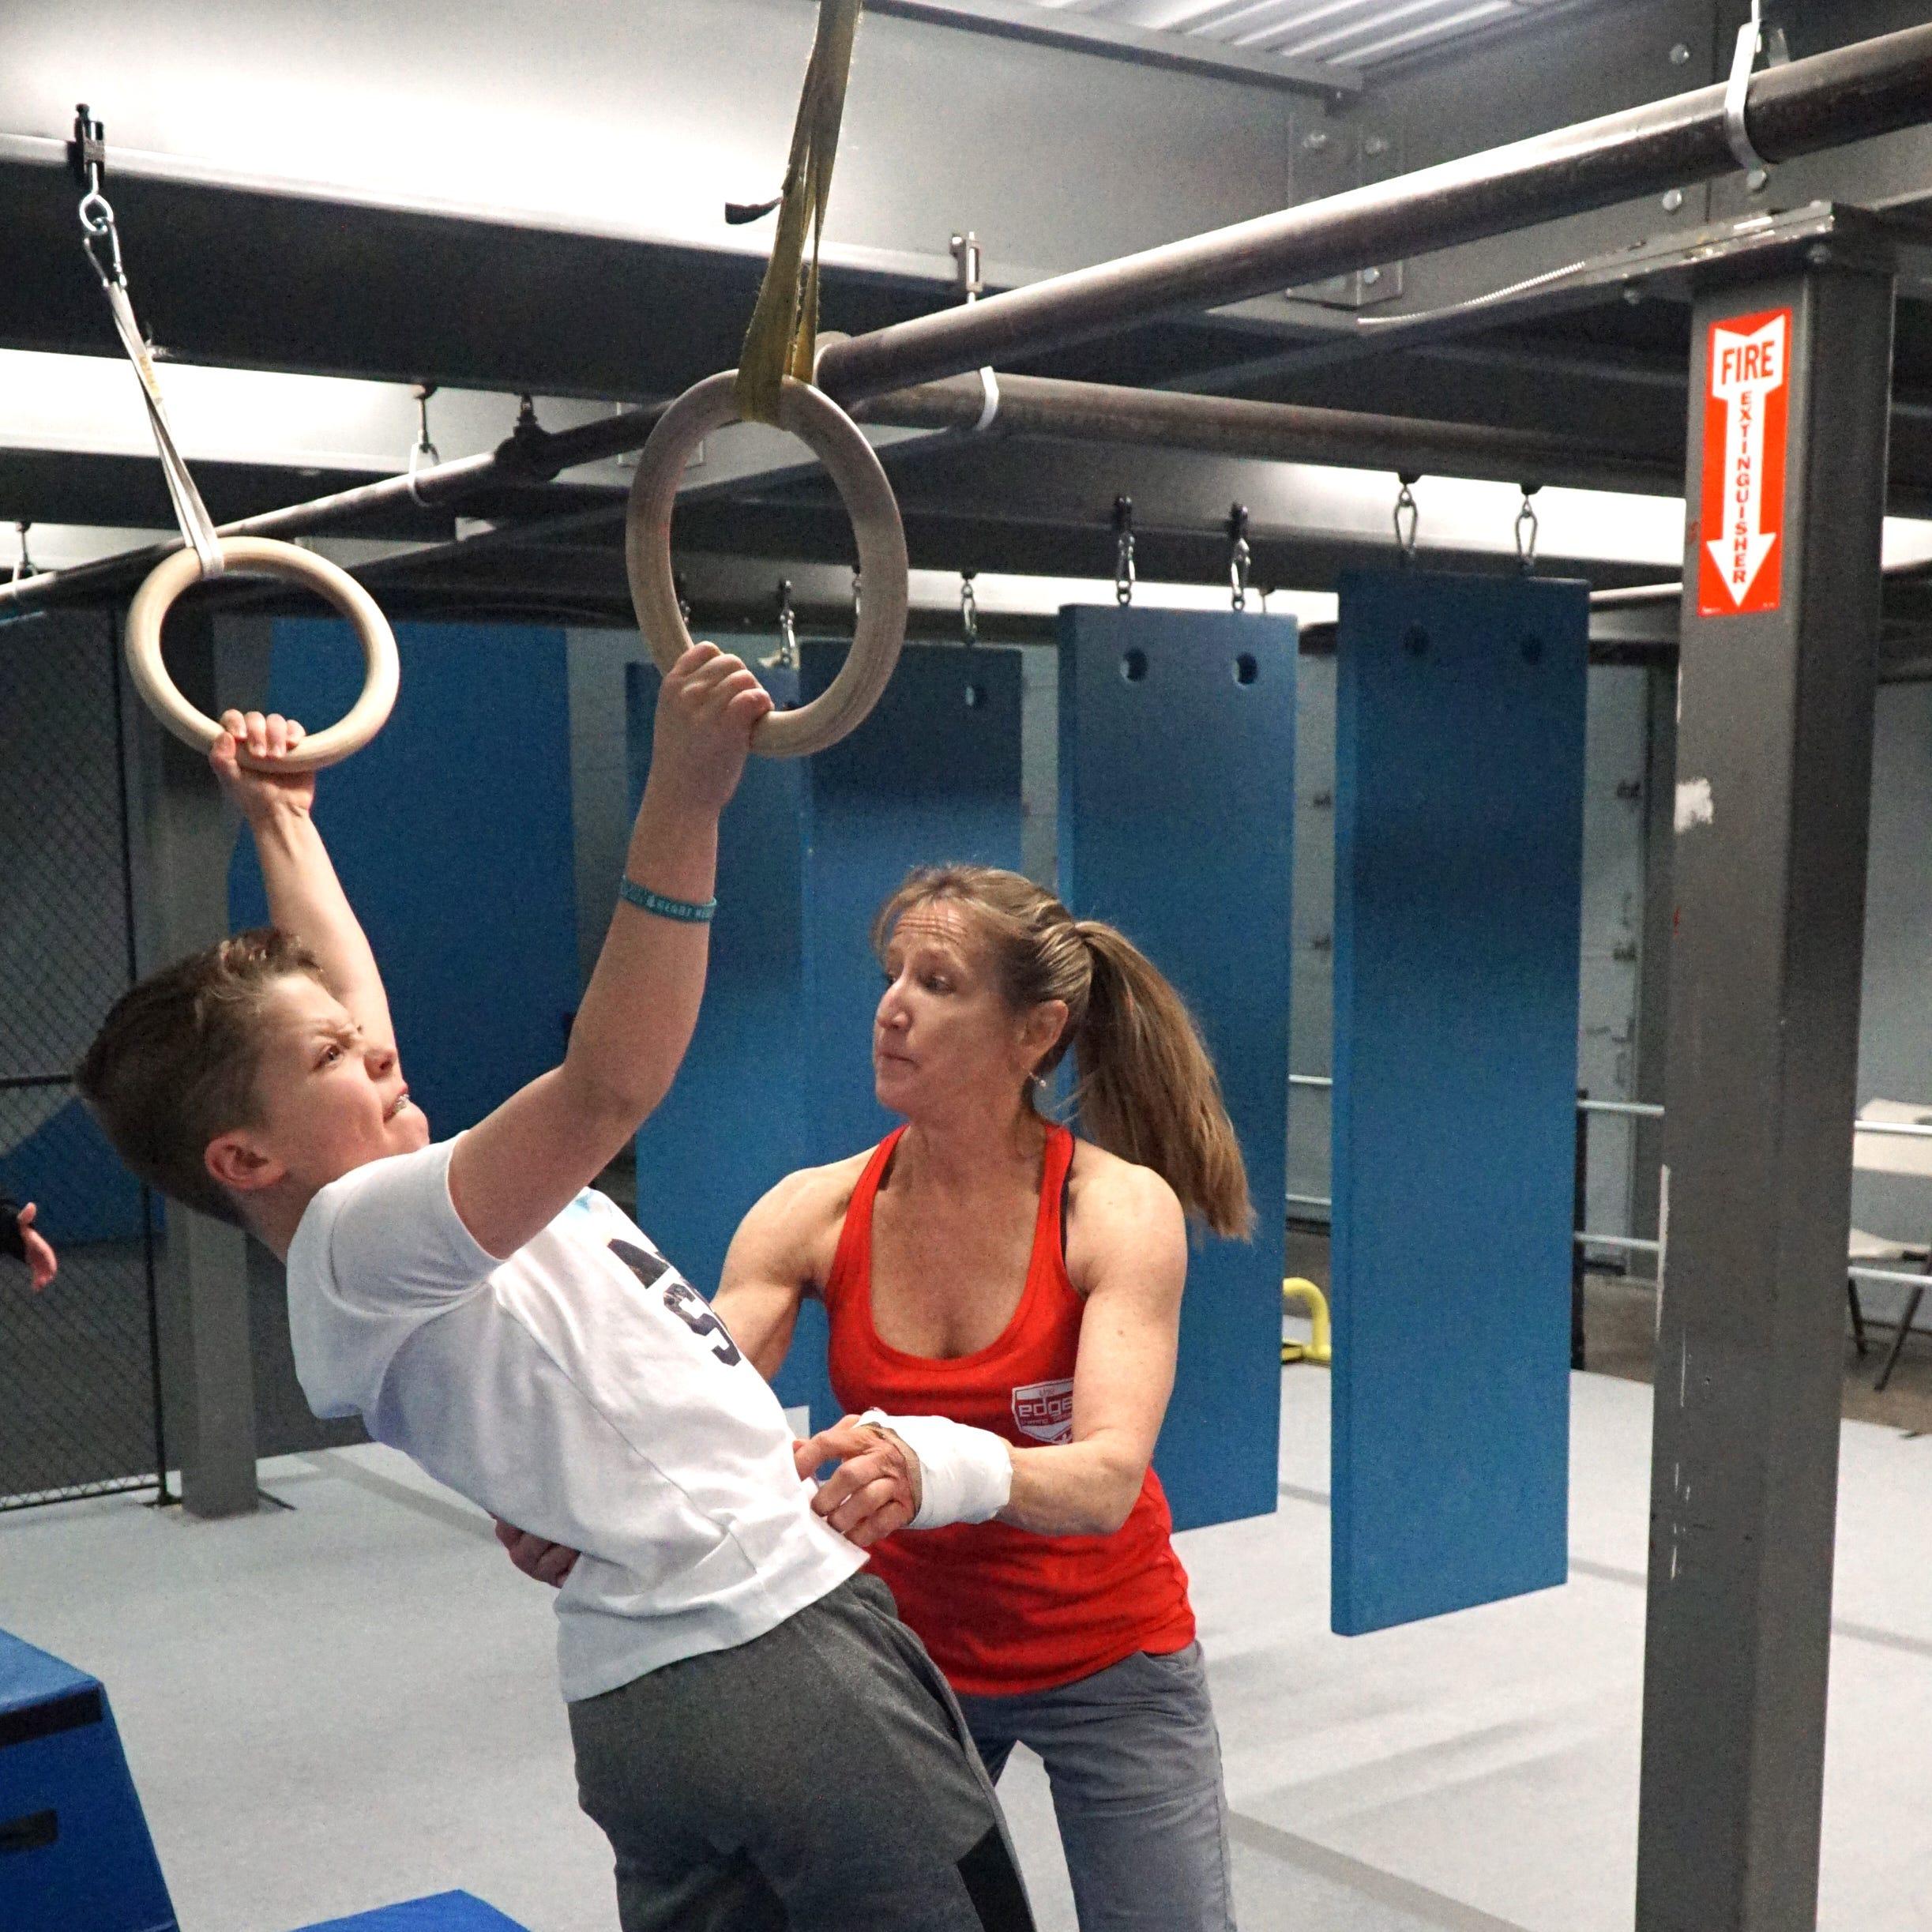 Ninja warrior training facility opens in Plymouth